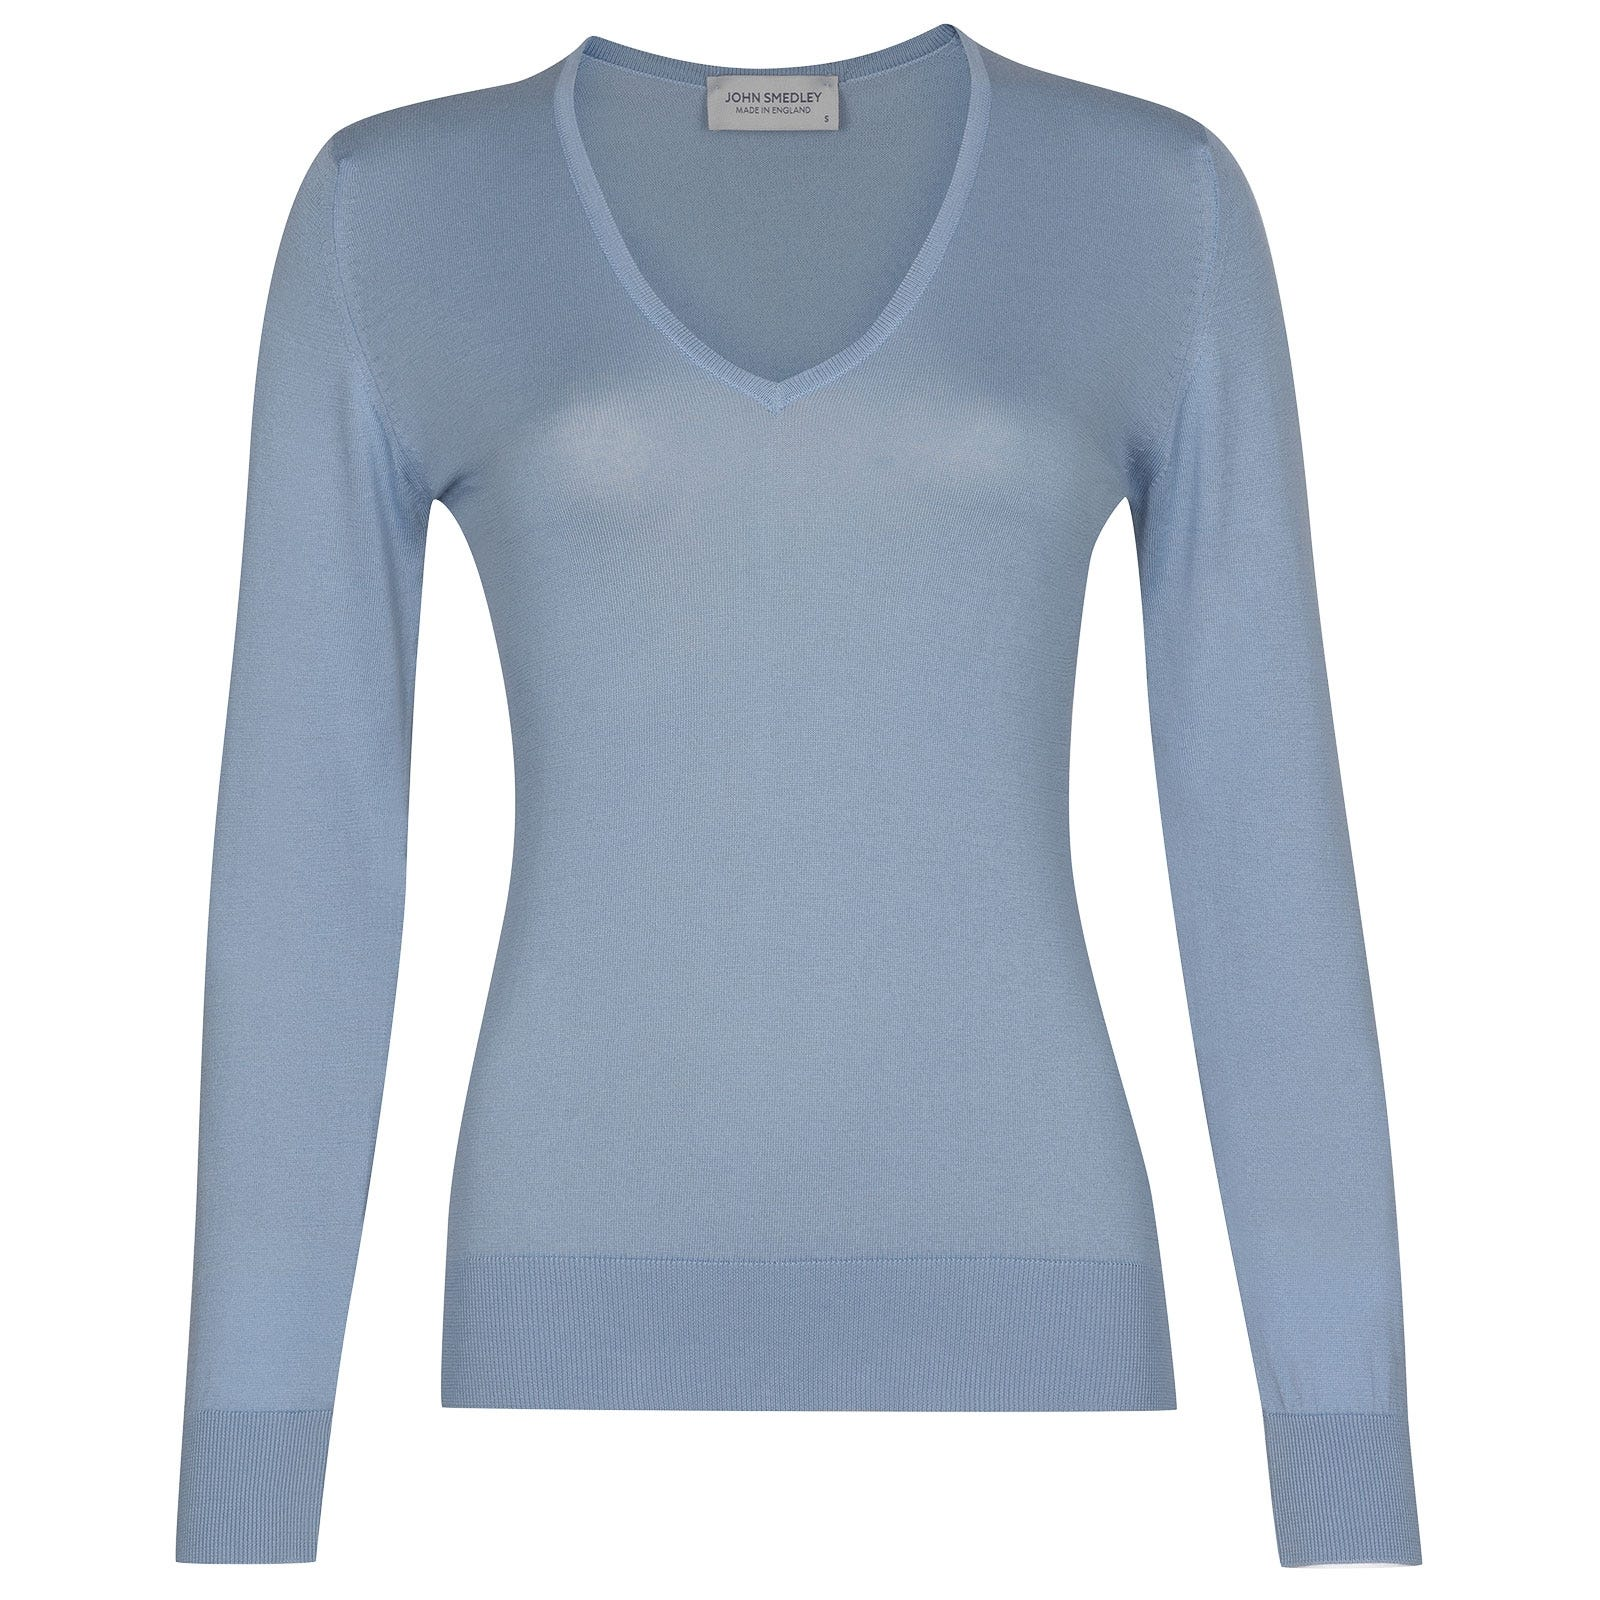 John Smedley Putney in Dusk Blue Sweater-XLG